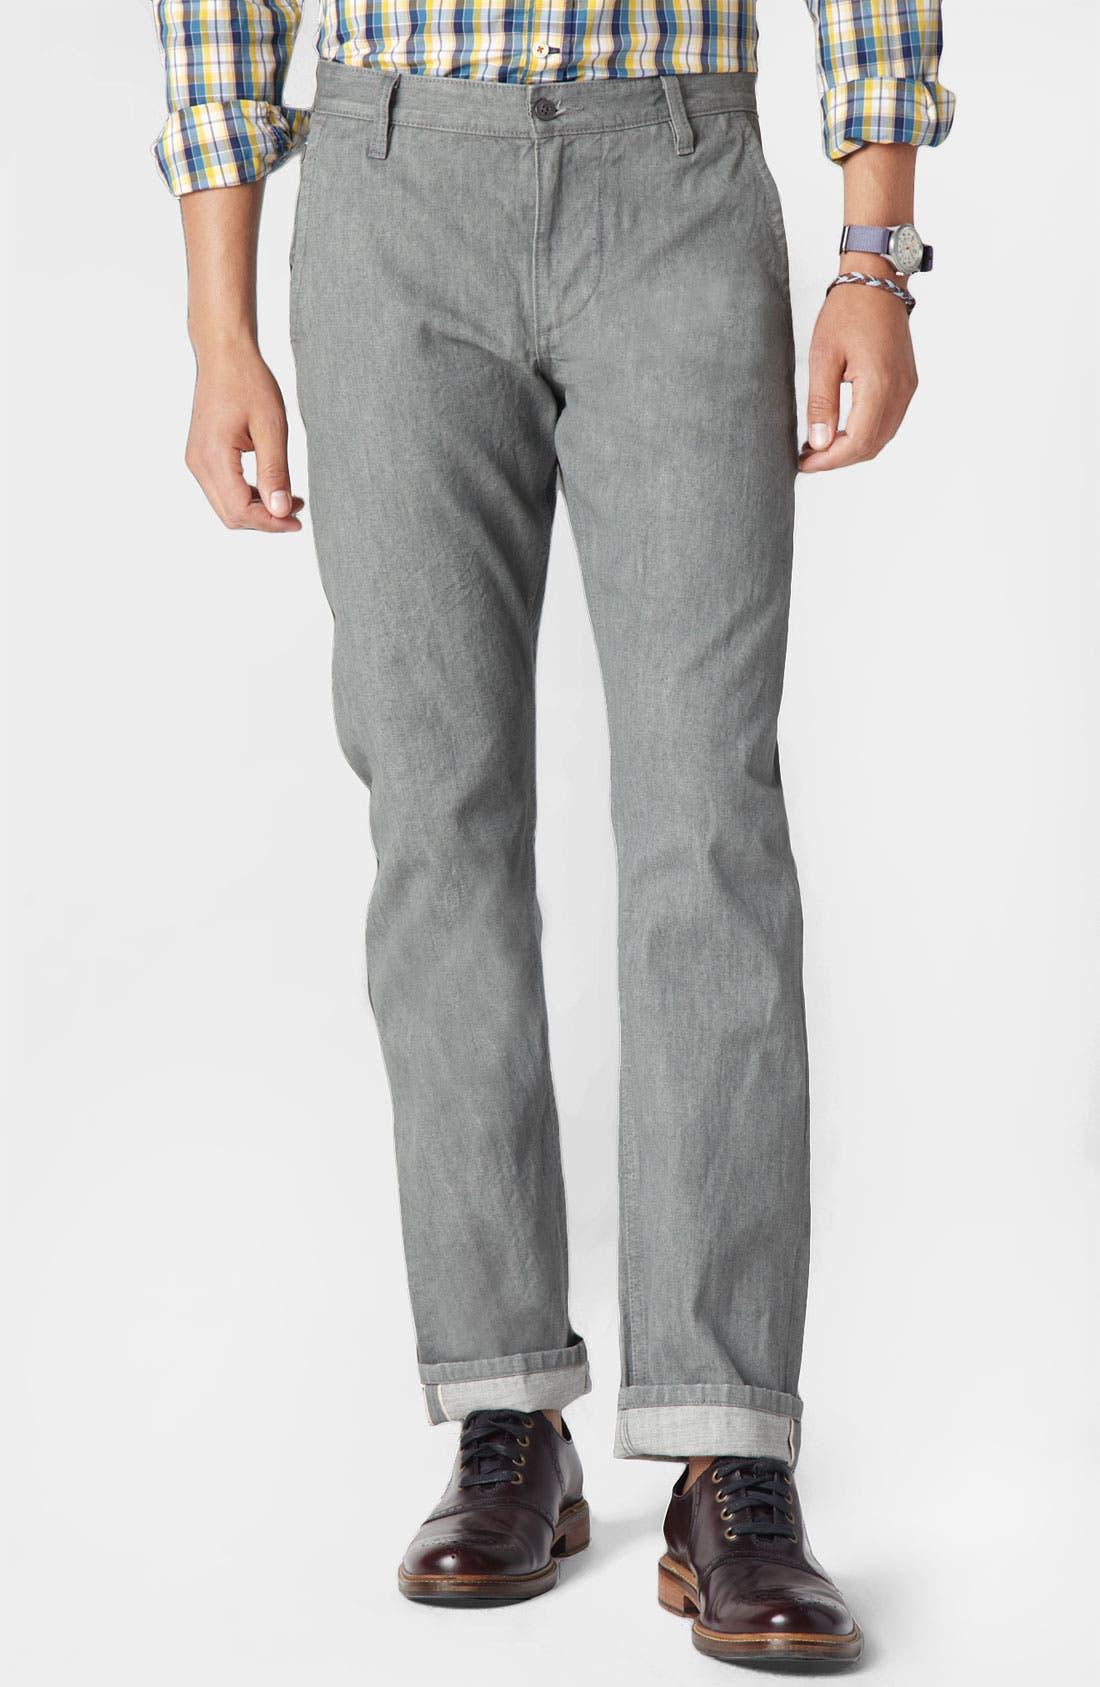 Alternate Image 1 Selected - Dockers® 'Alpha Khaki - Selvedge' Slim Straight Leg Pants (Online Exclusive)